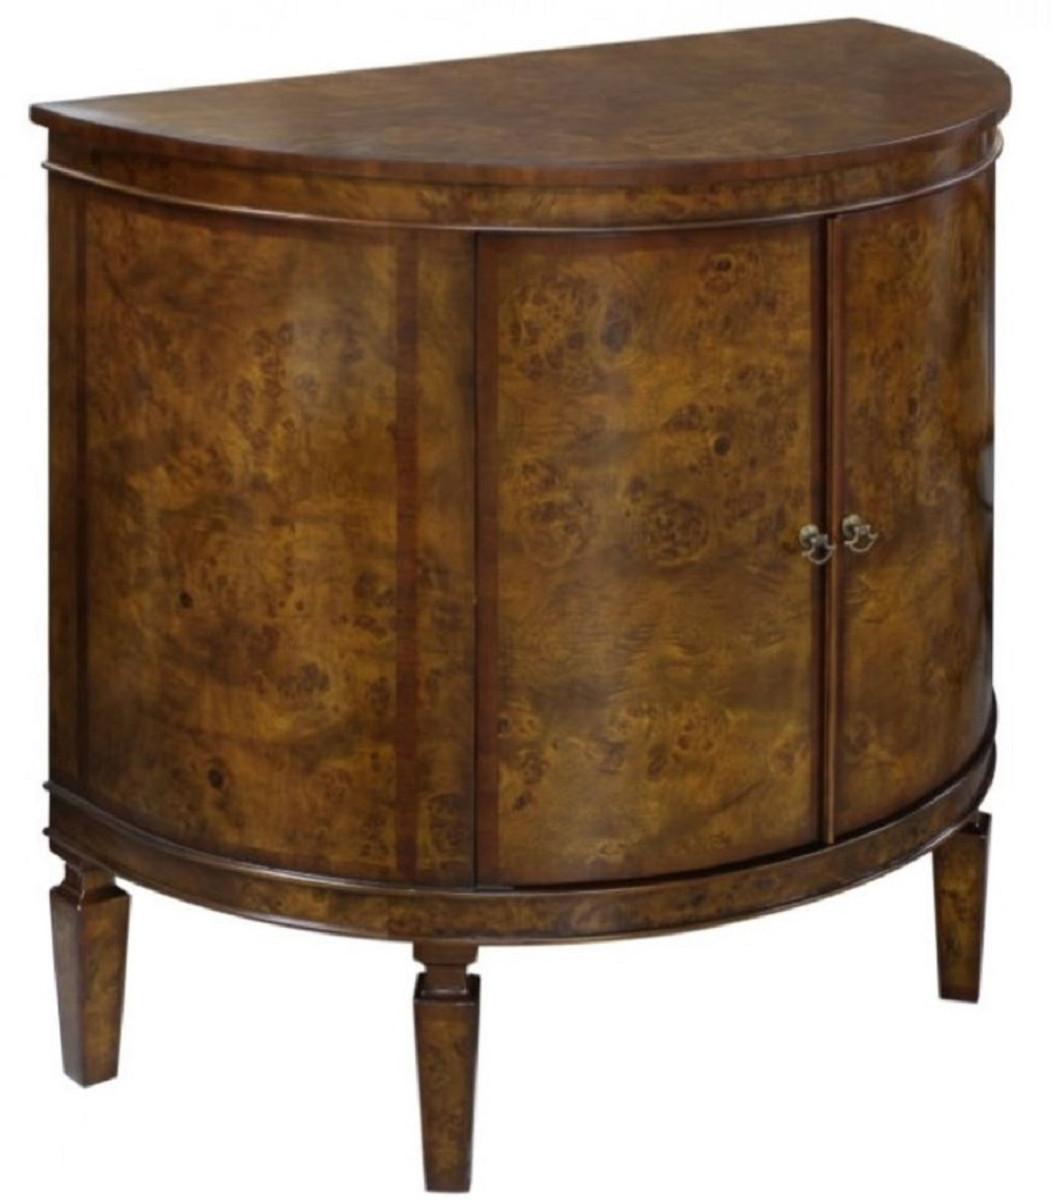 casa padrino luxus jugendstil kommode hellbraun braun 84 x 45 x h 83 cm kleiner halbrunder. Black Bedroom Furniture Sets. Home Design Ideas